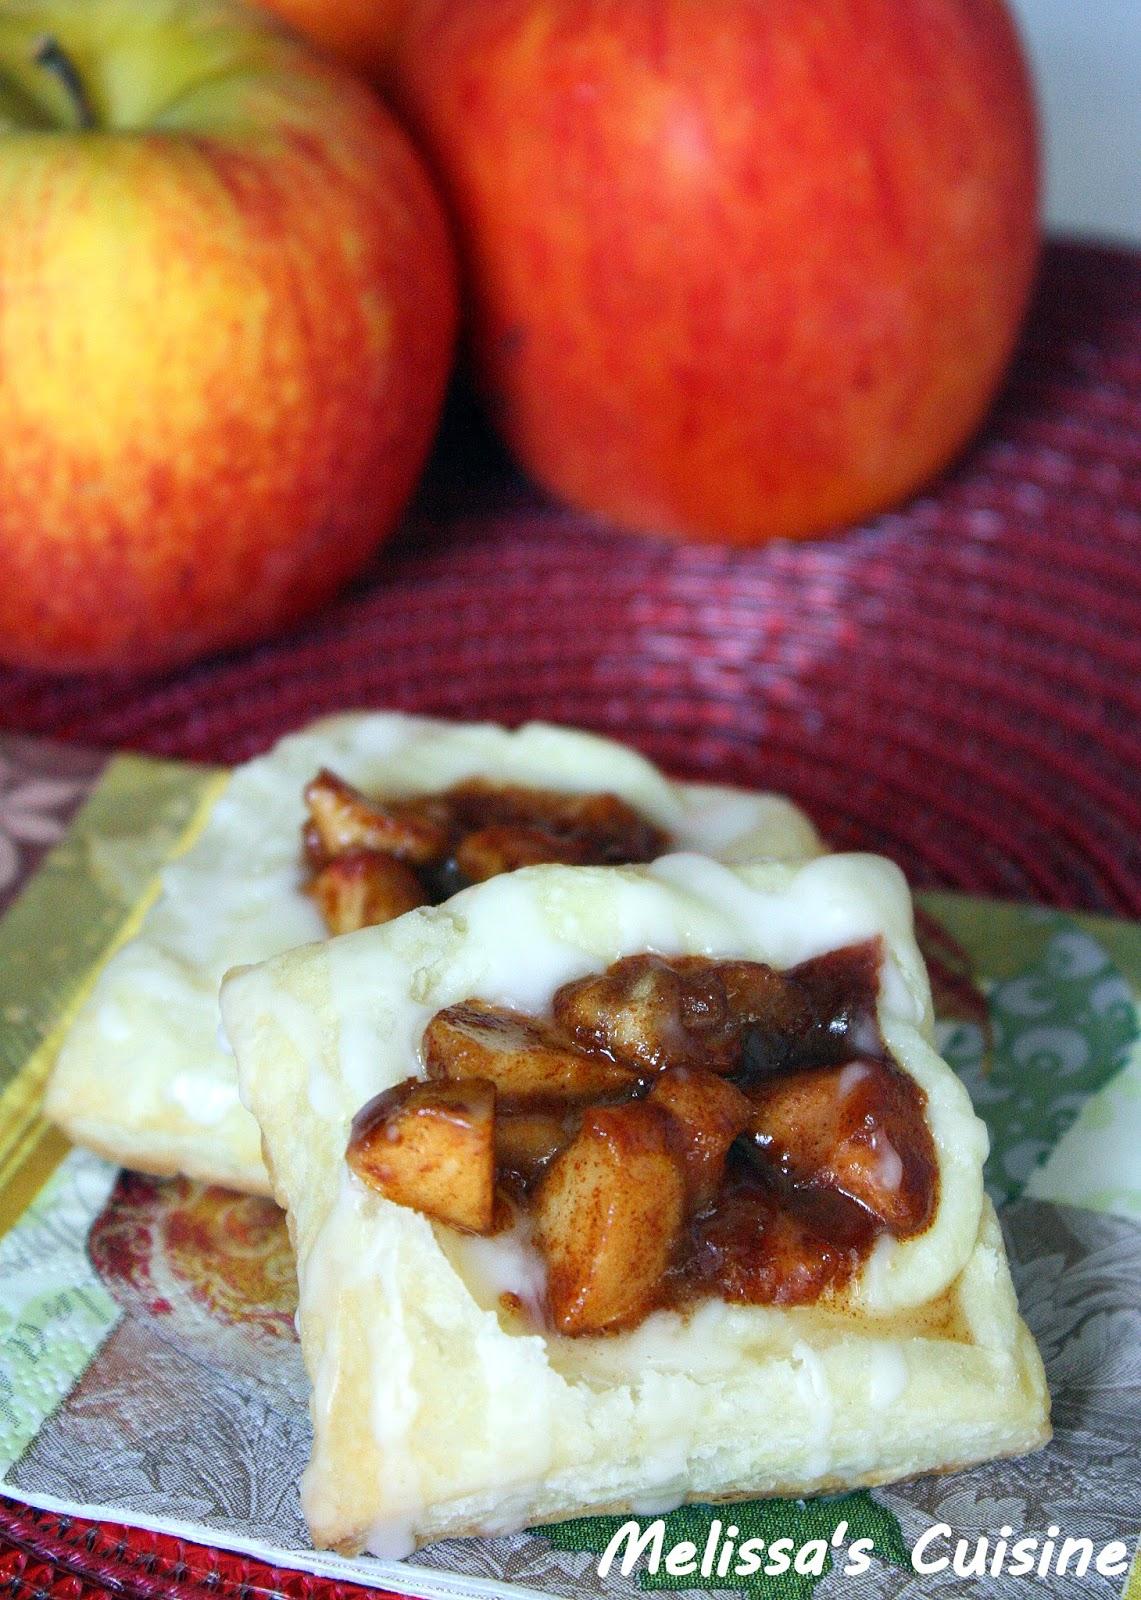 Melissa's Cuisine: Apple Cream Cheese Danish